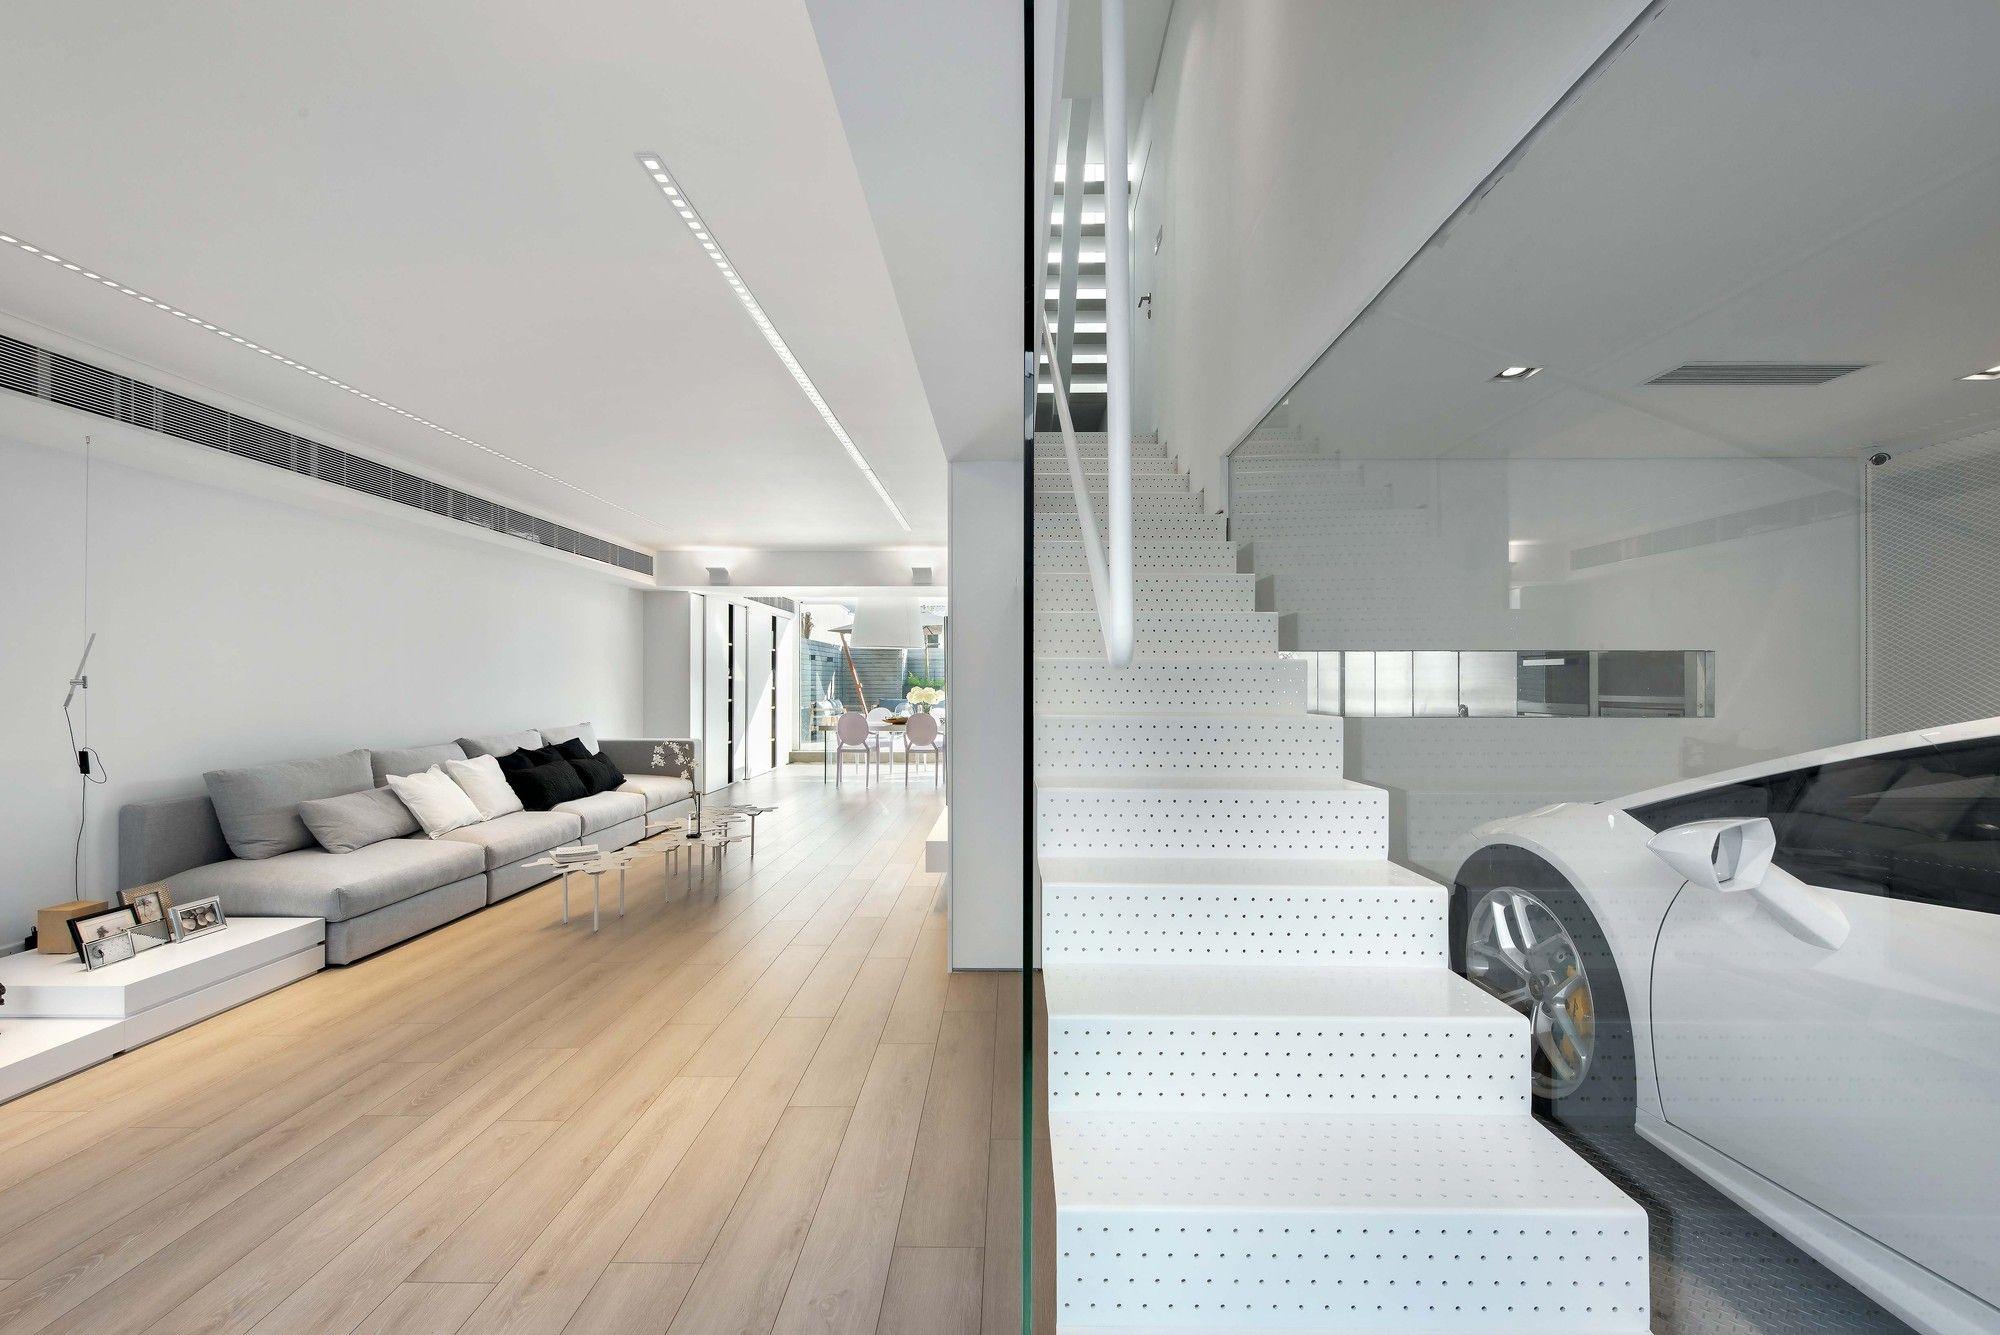 Home interior design hong kong house in hong kong  millimeter interior design  hausideen